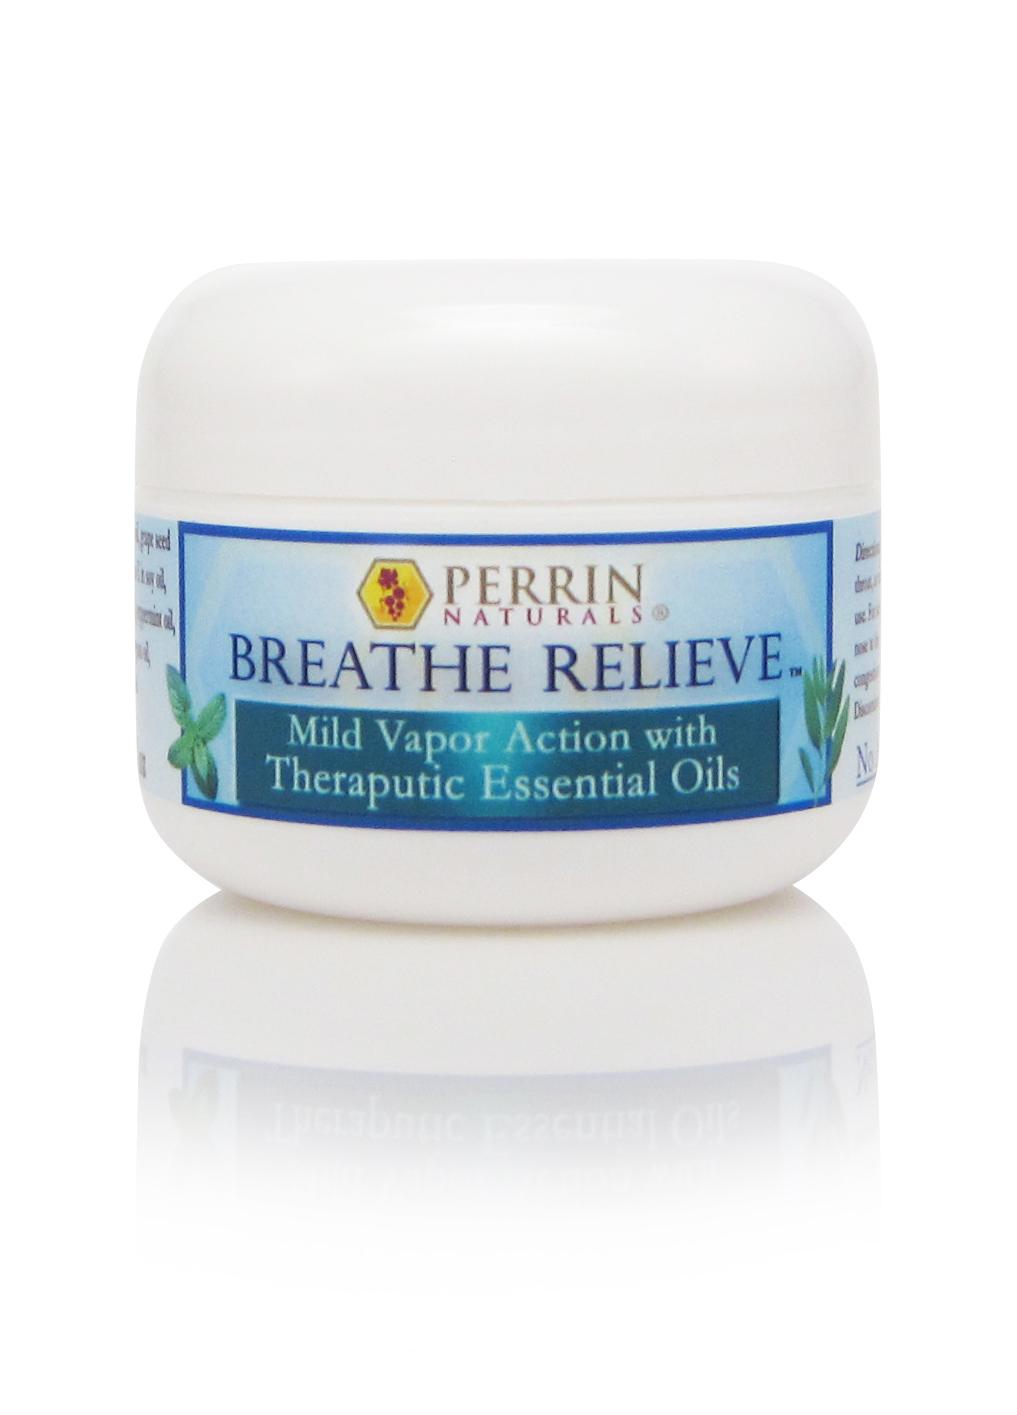 breathe relieve natural decongestant